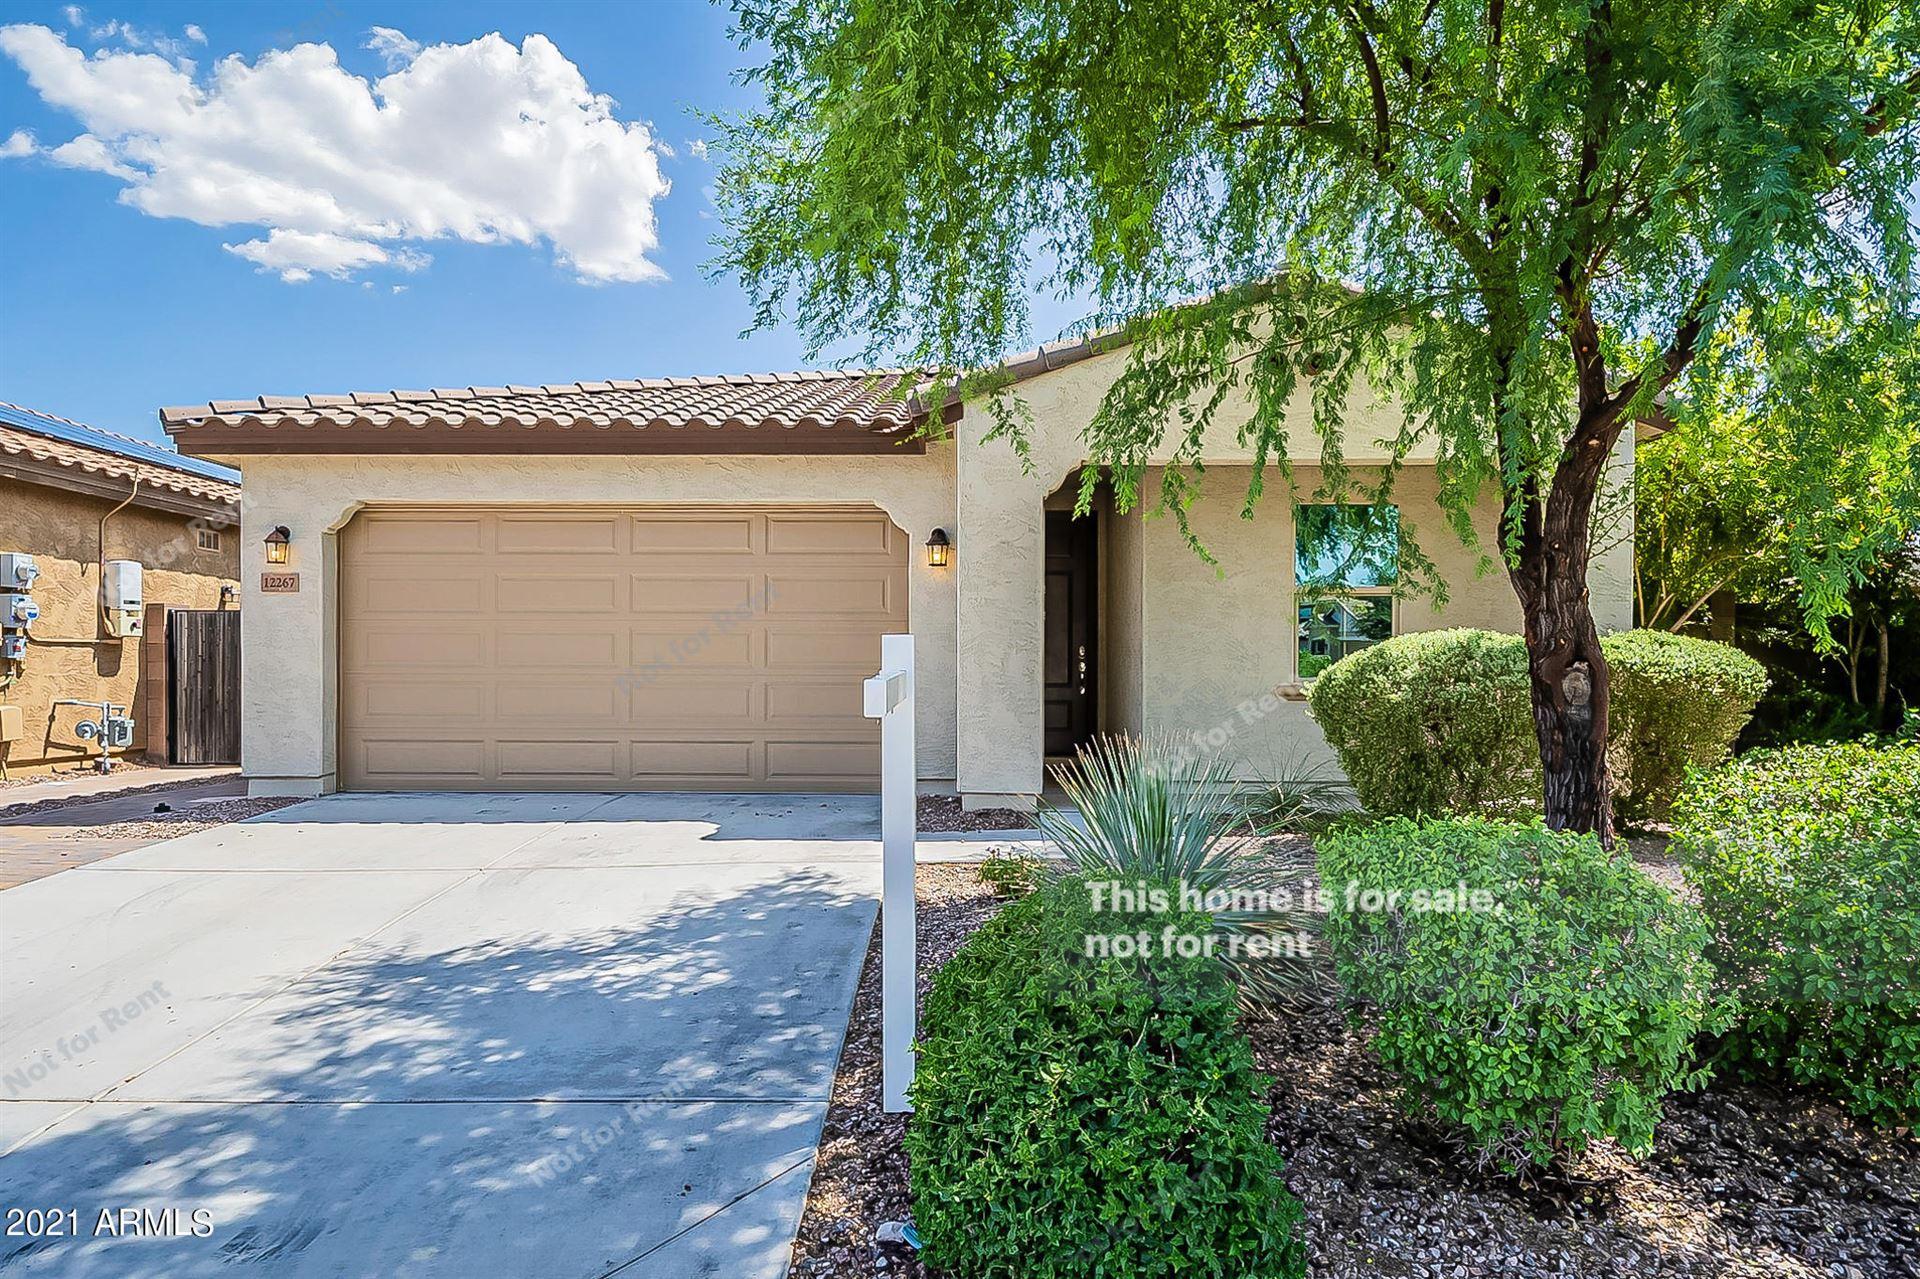 12267 W PRICKLY PEAR Trail, Peoria, AZ 85383 - MLS#: 6273061